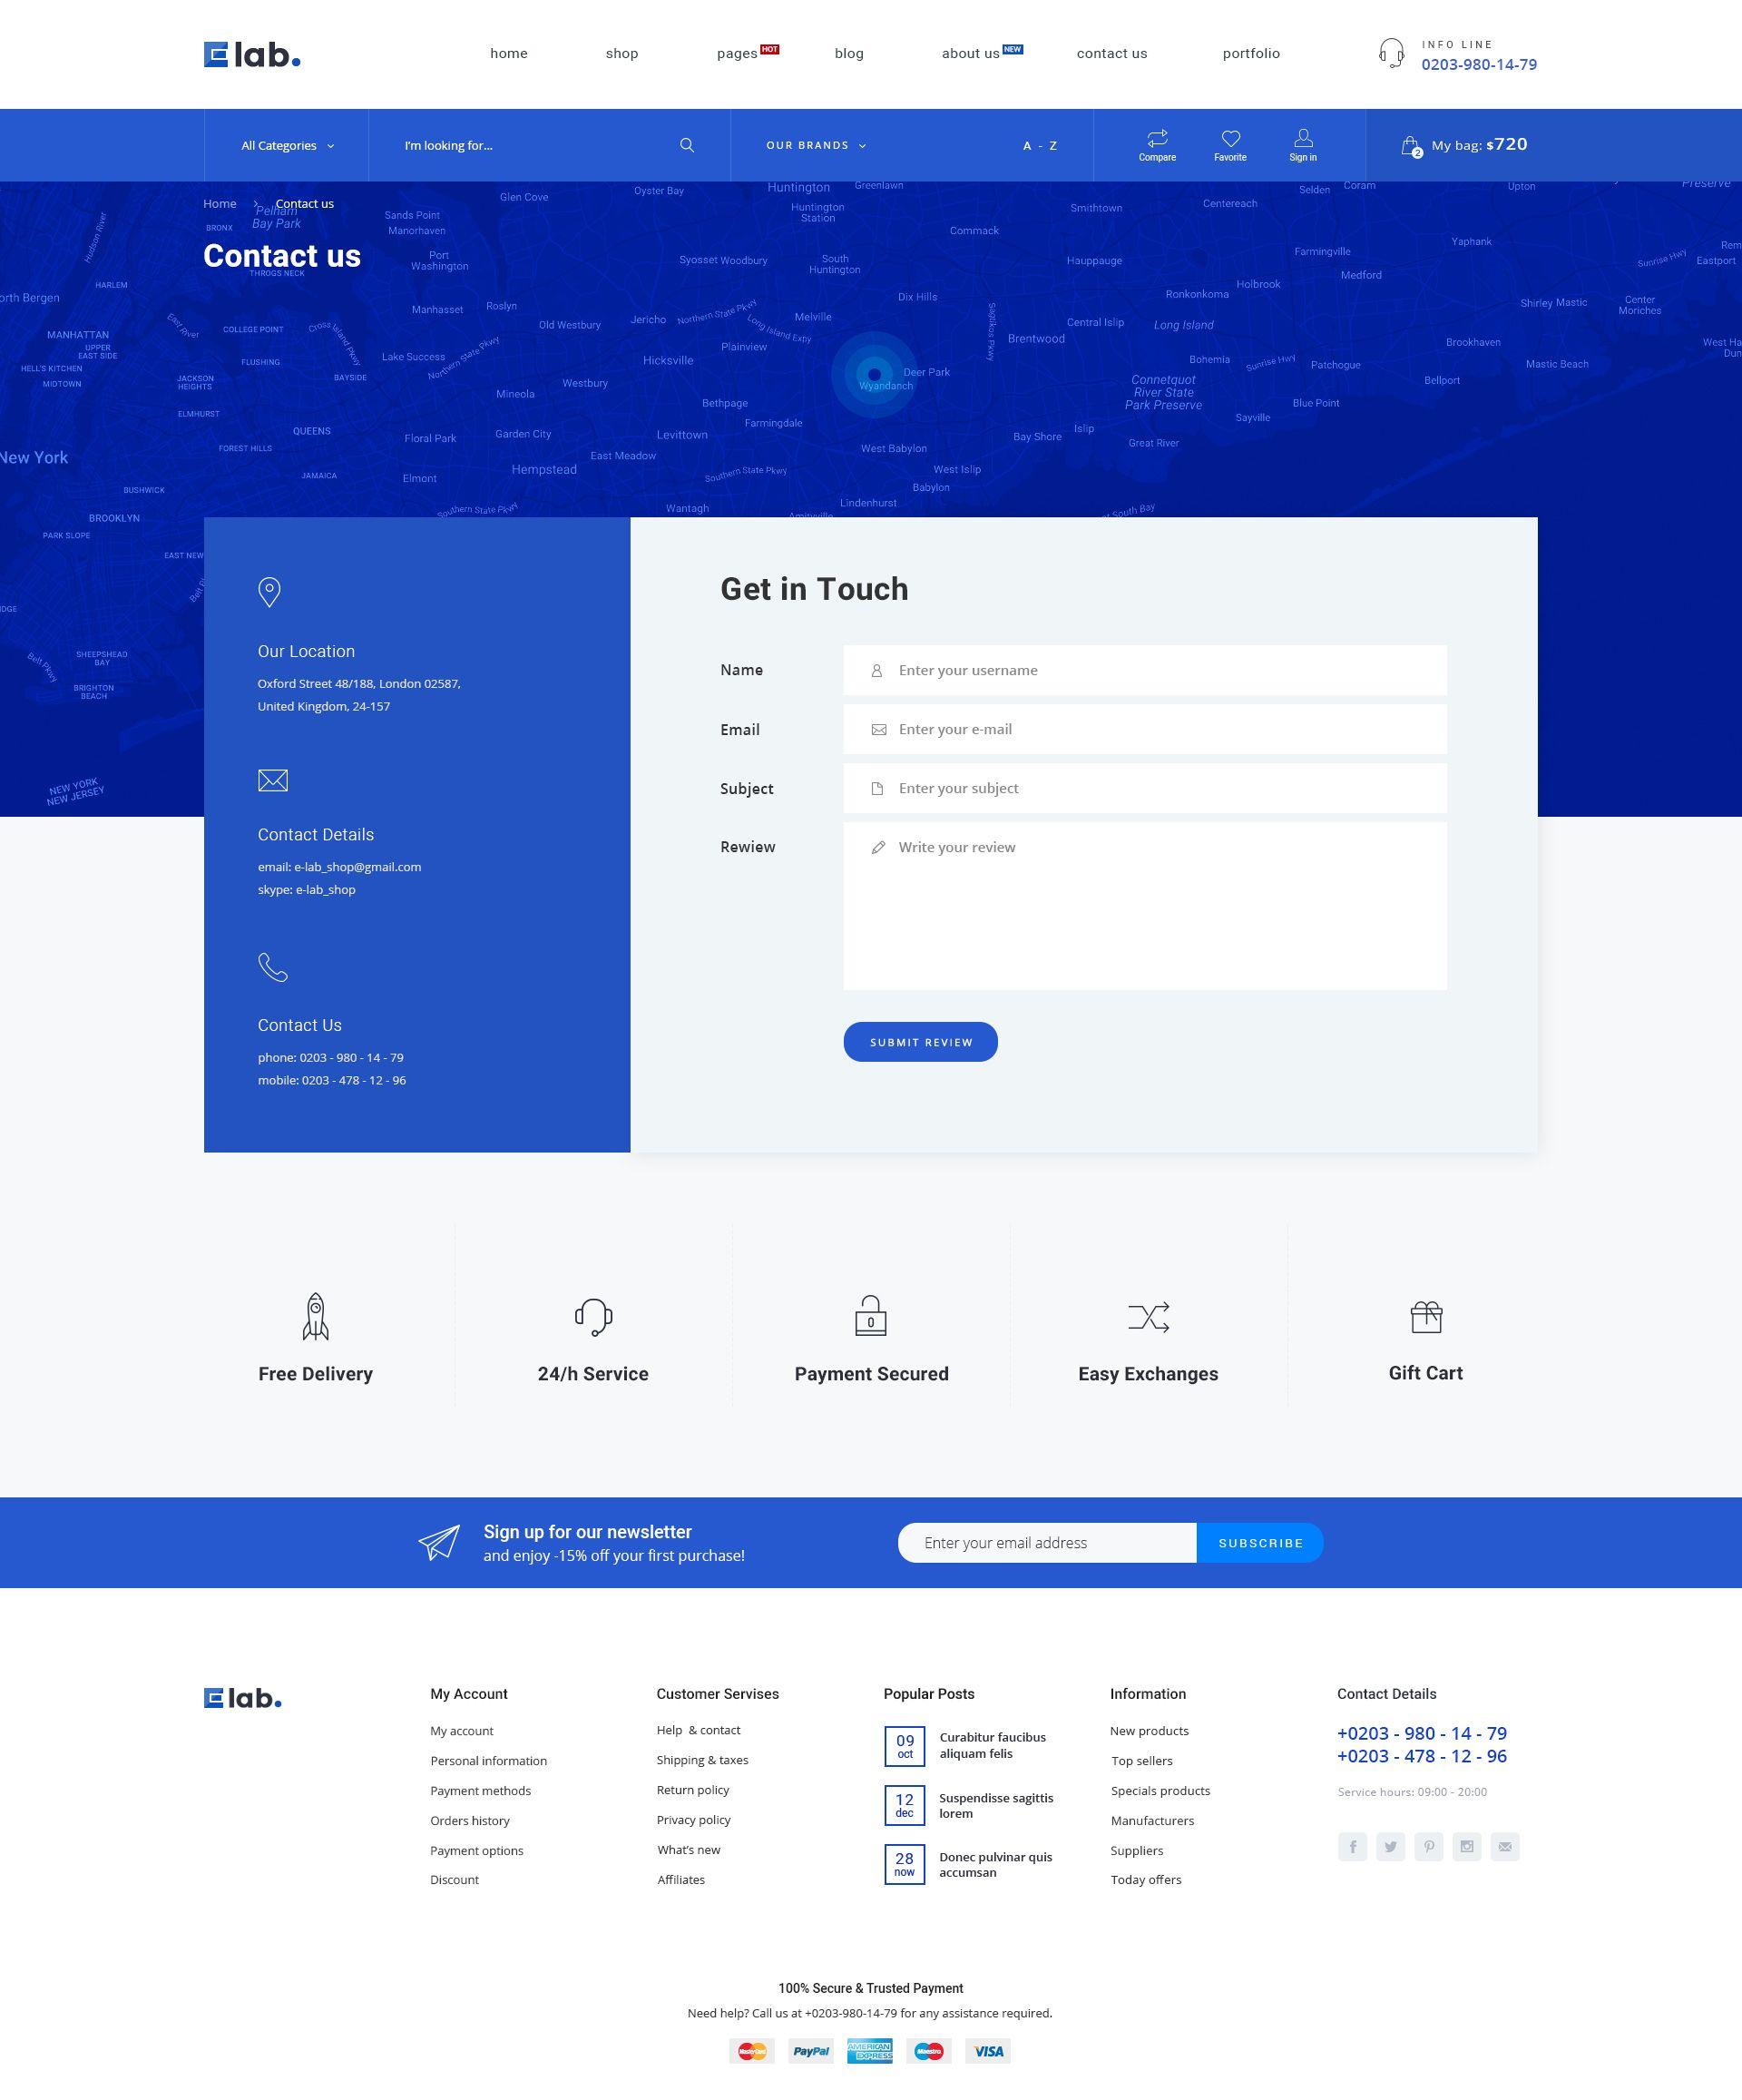 E Lab Ecommerce Psd Template Ecommerce Lab Template Psd Simple Web Design Form Design Web Contact Us Page Design